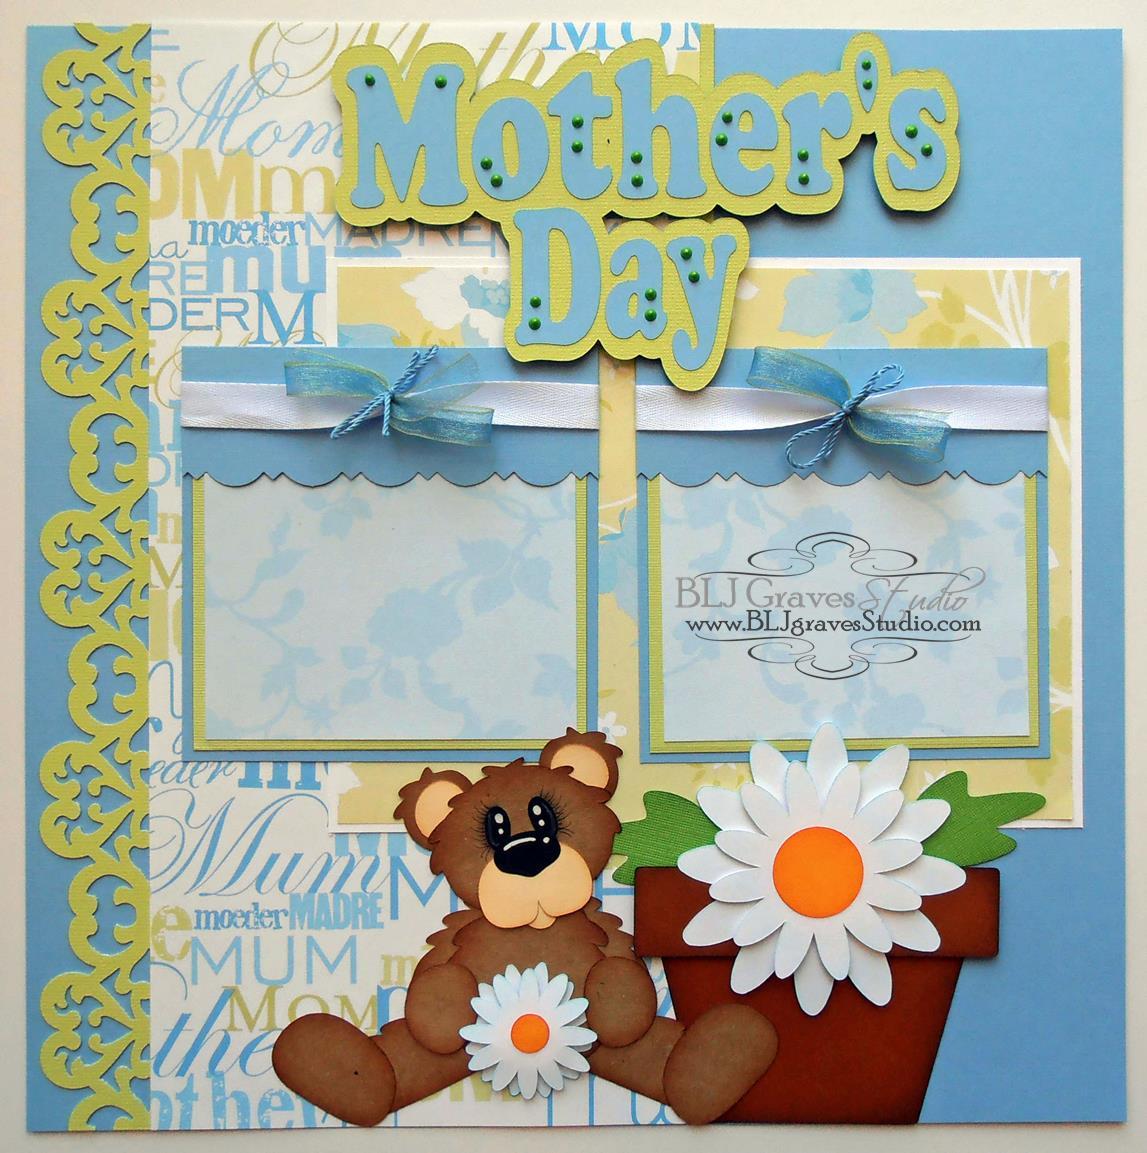 blj graves studio mother s day scrapbook page